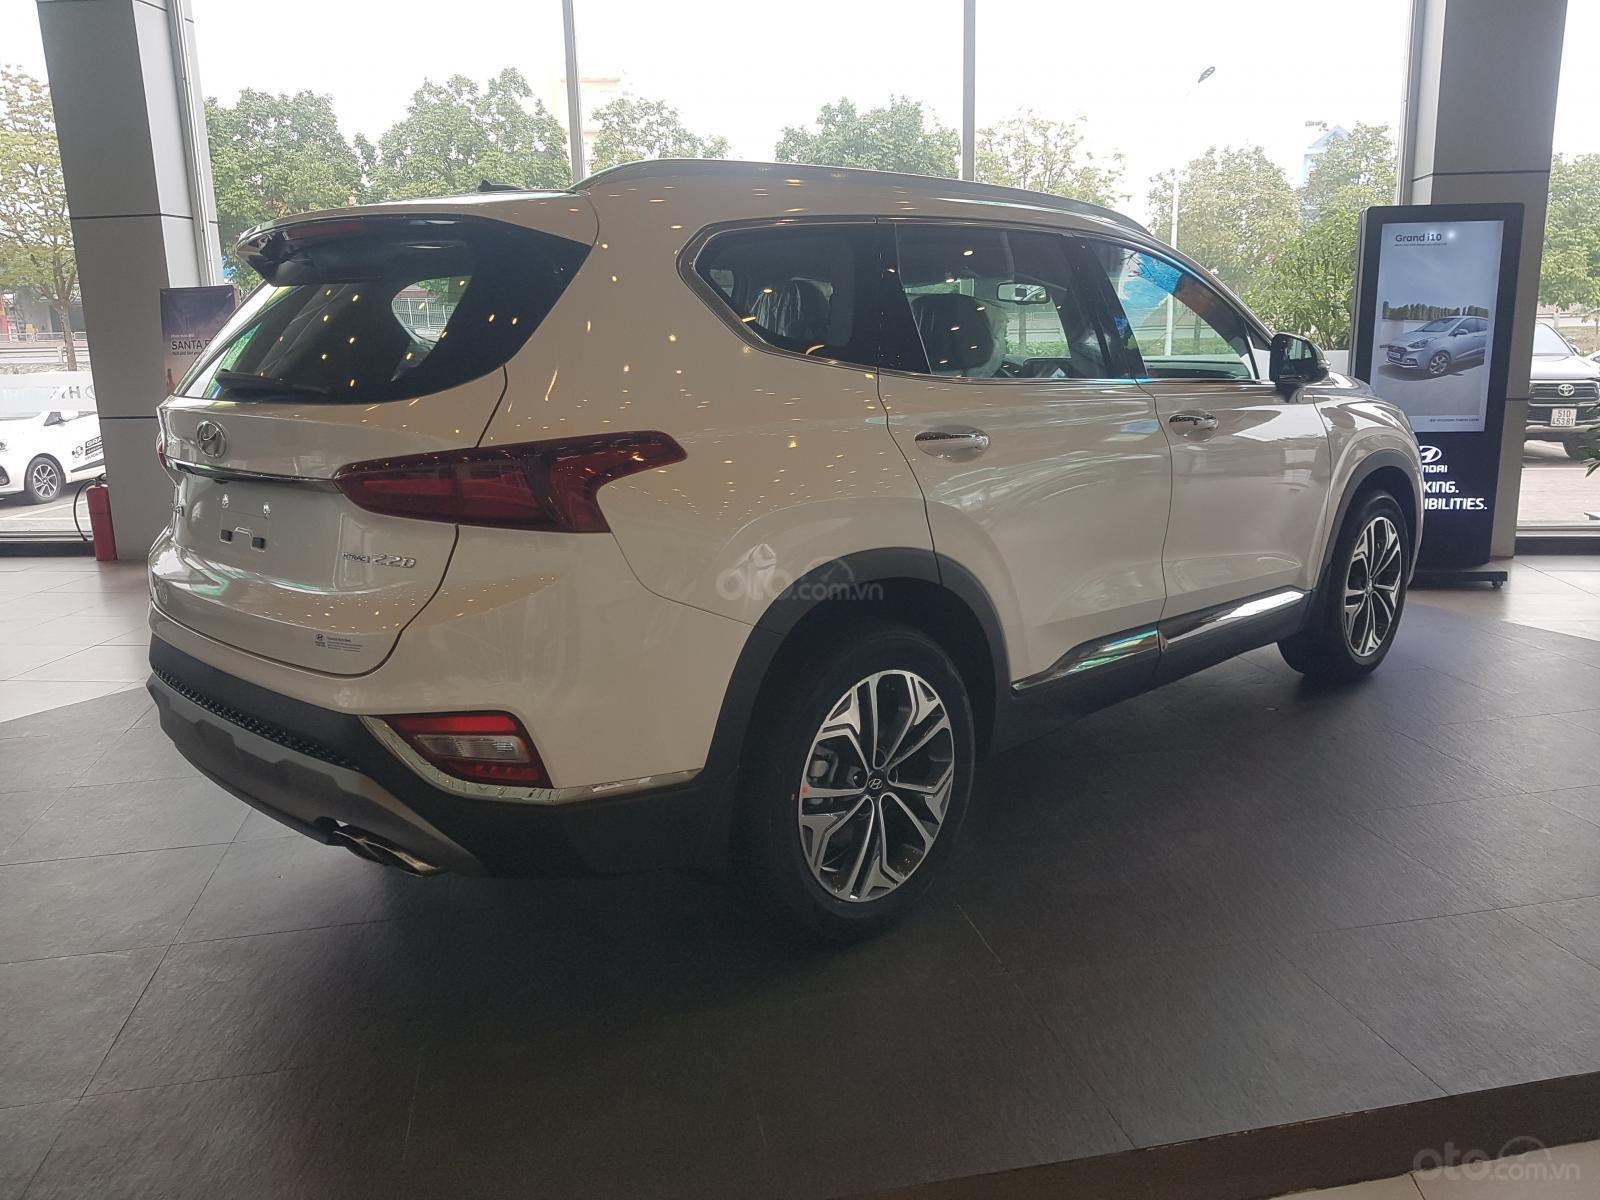 Bán Hyundai Santafe 2019 - Vay 80% - 313tr có xe ngay-3